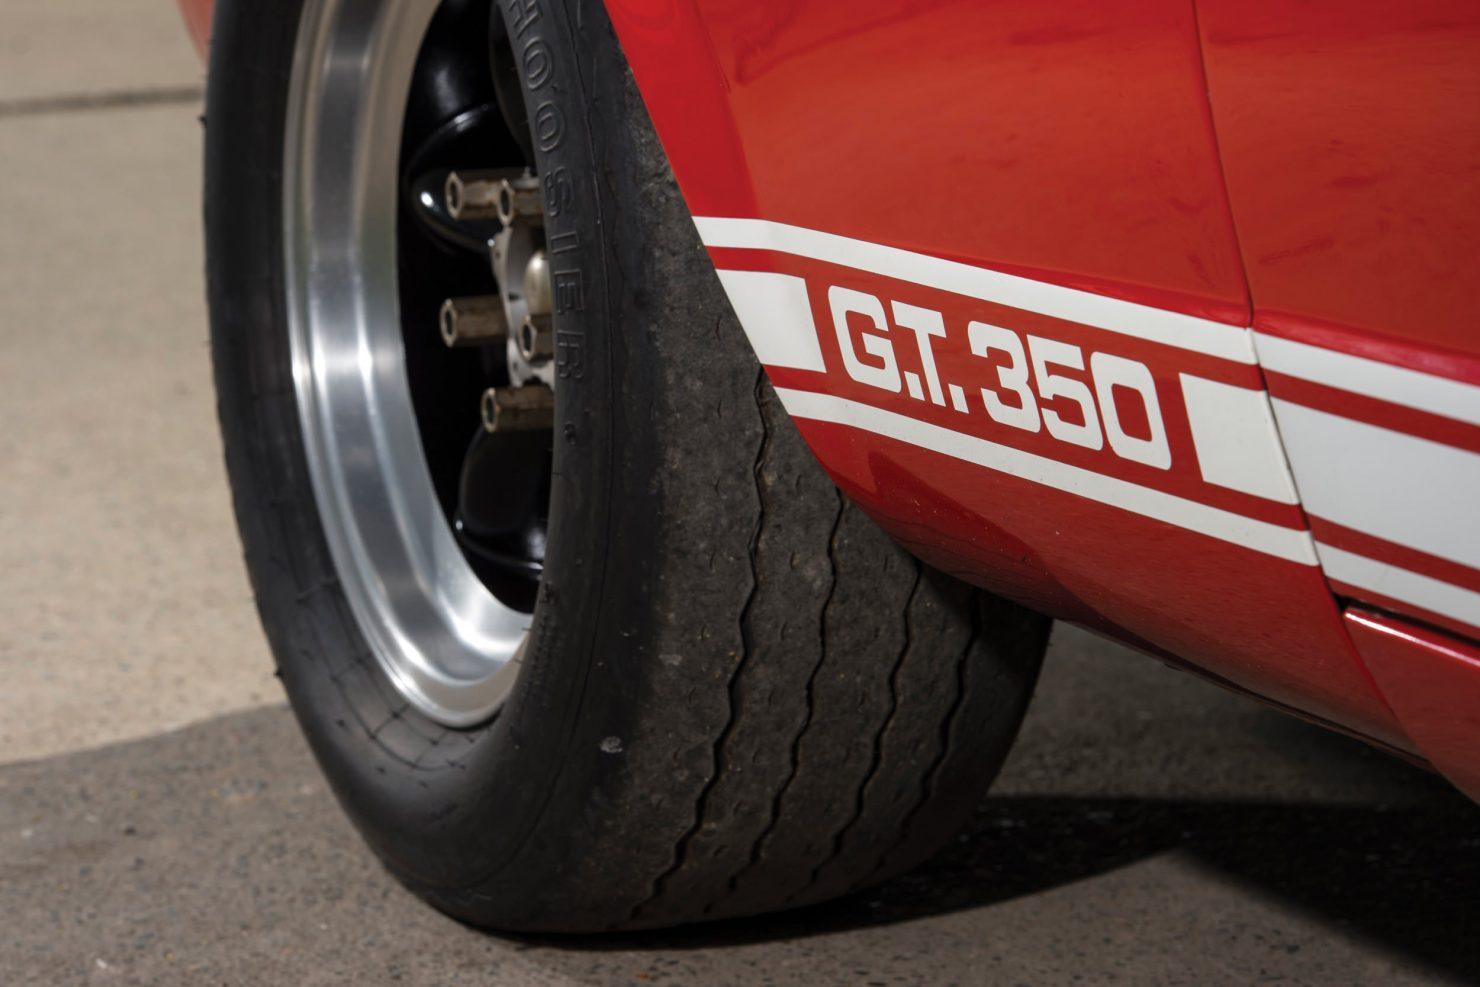 shelby gt350 race car 6 1480x987 - 1966 Shelby GT350 - Period SCCA Race Car